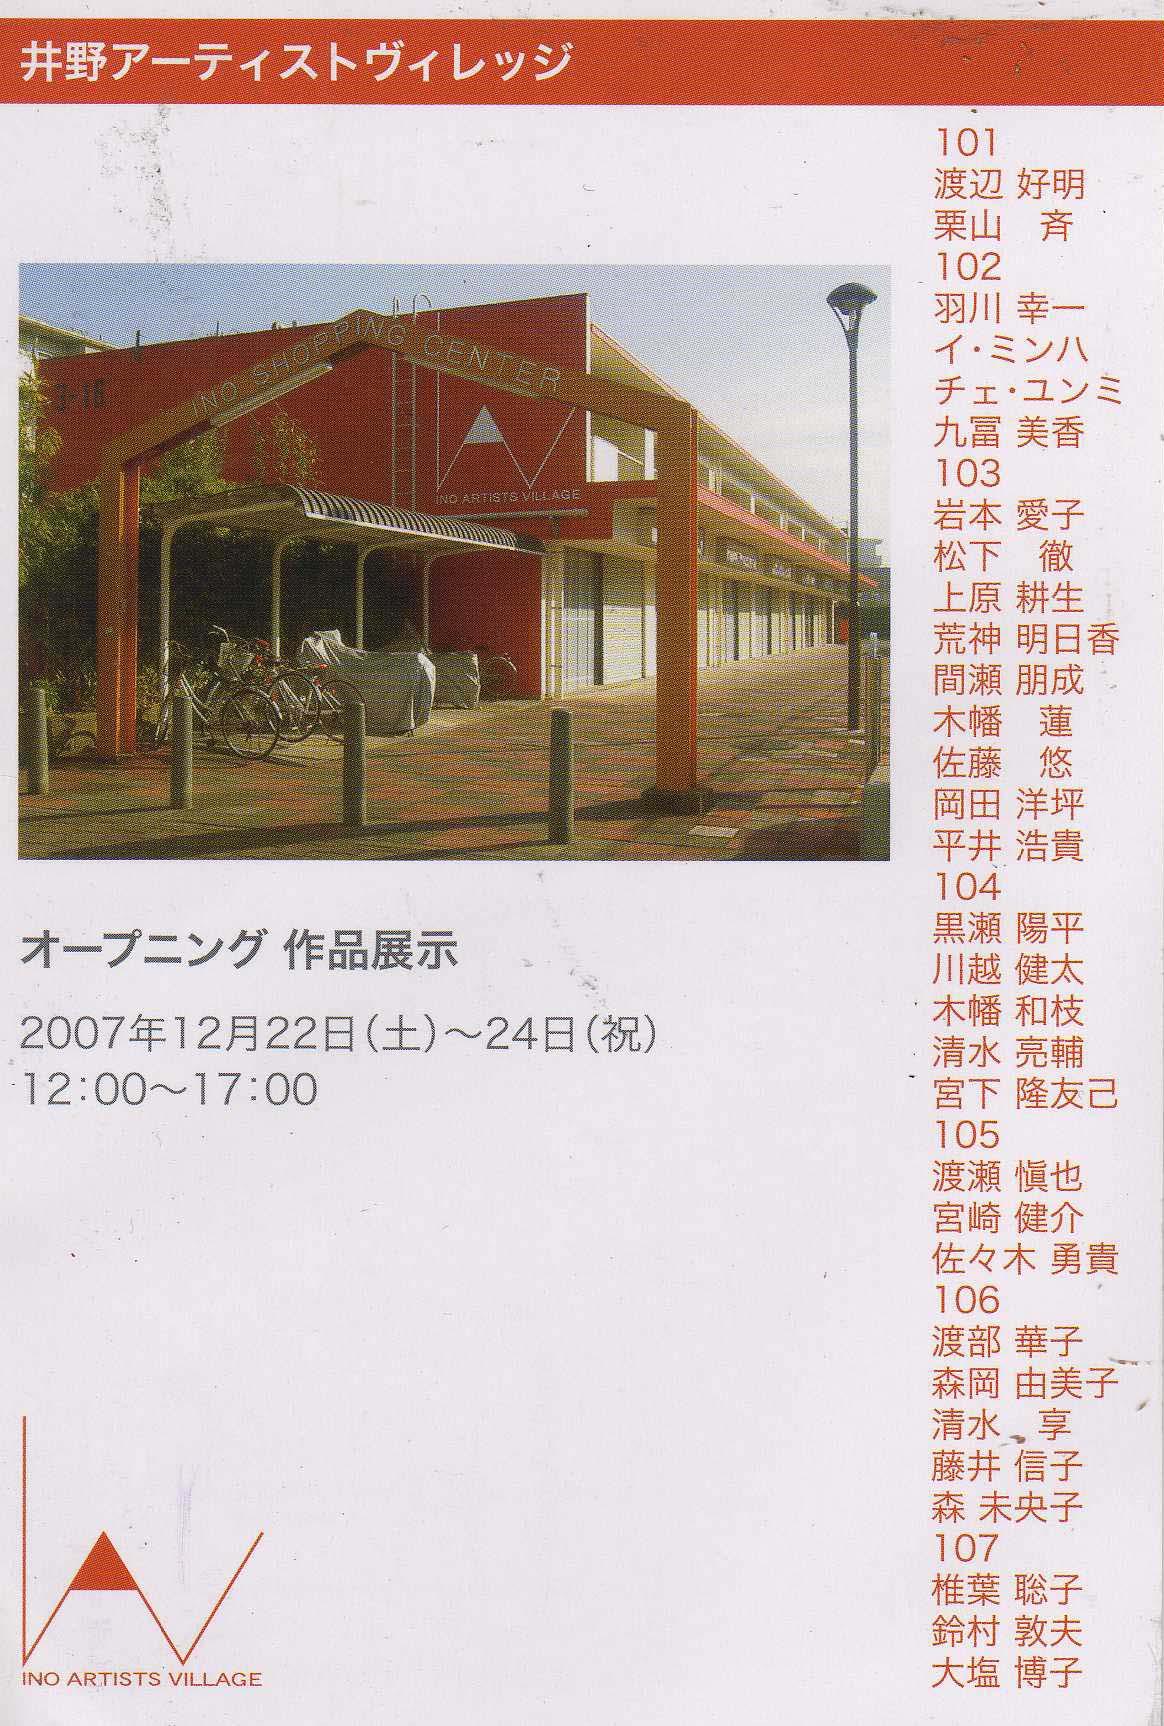 f62c984e.jpg